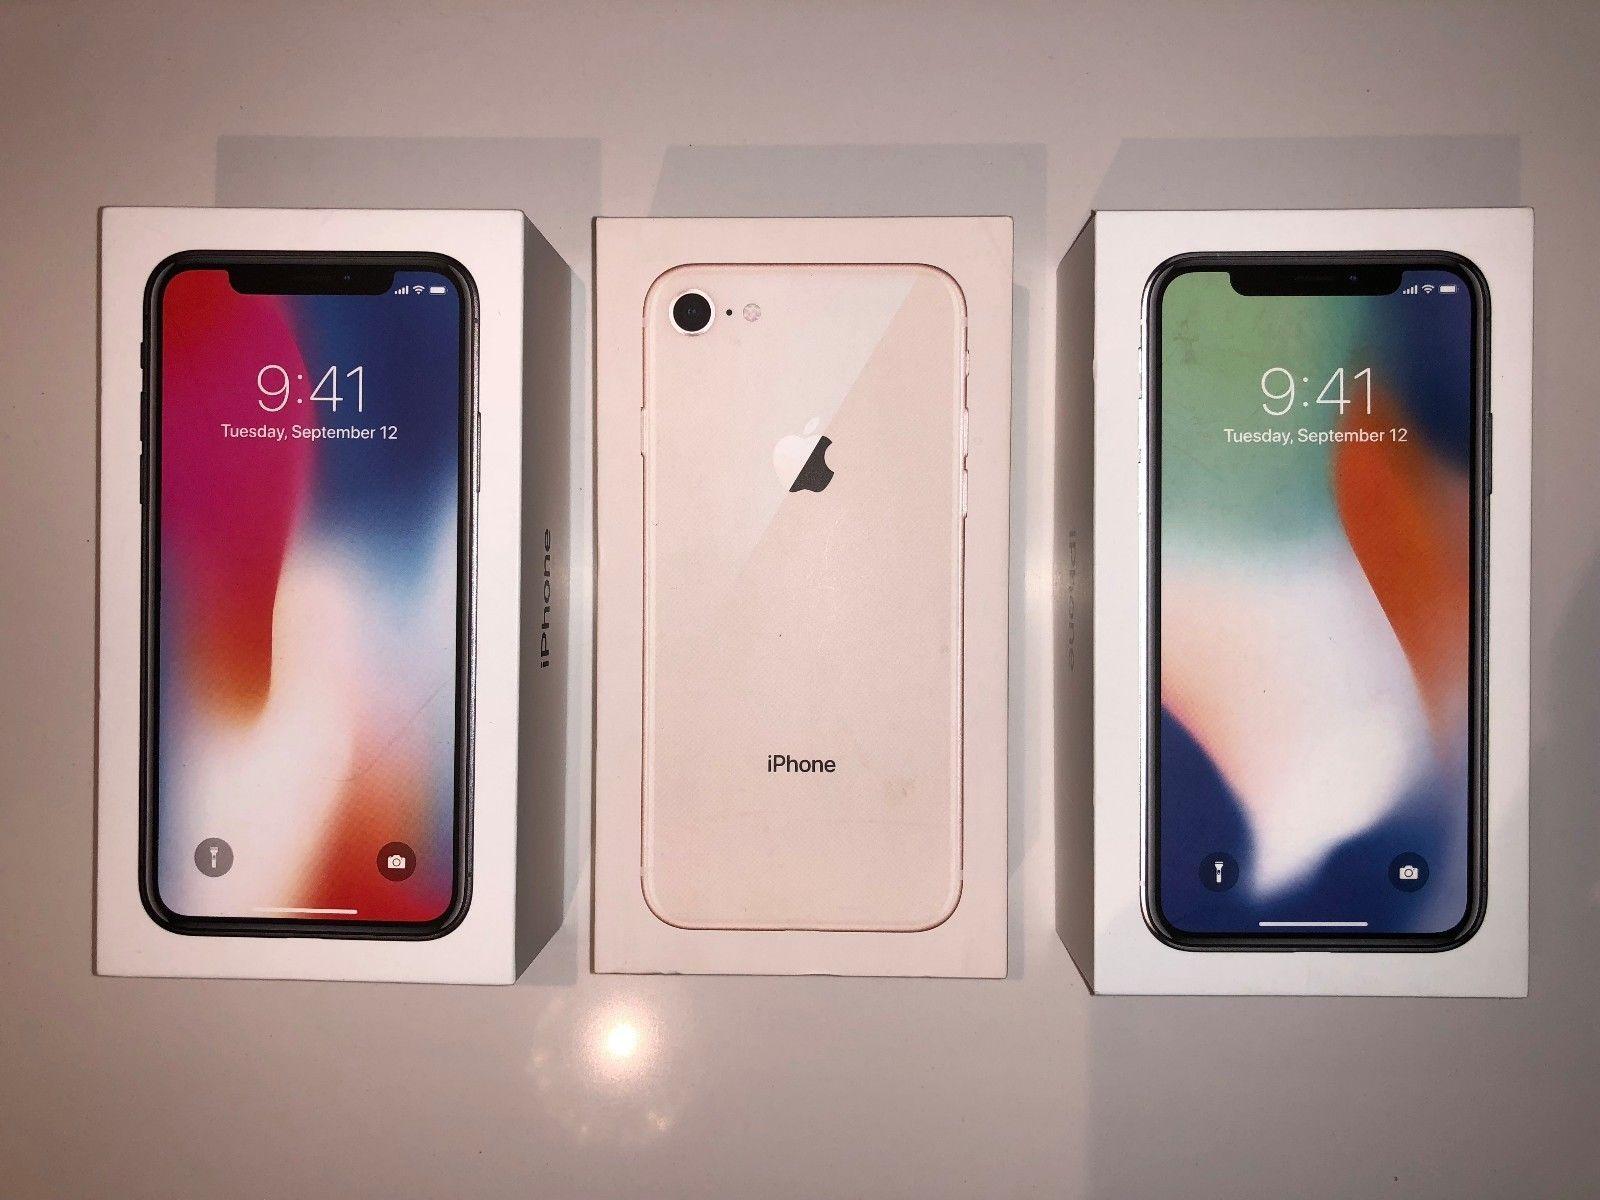 iPhone X 256GB .64GB  Unlocked- USA Model Apple Warranty - BRAND NEW